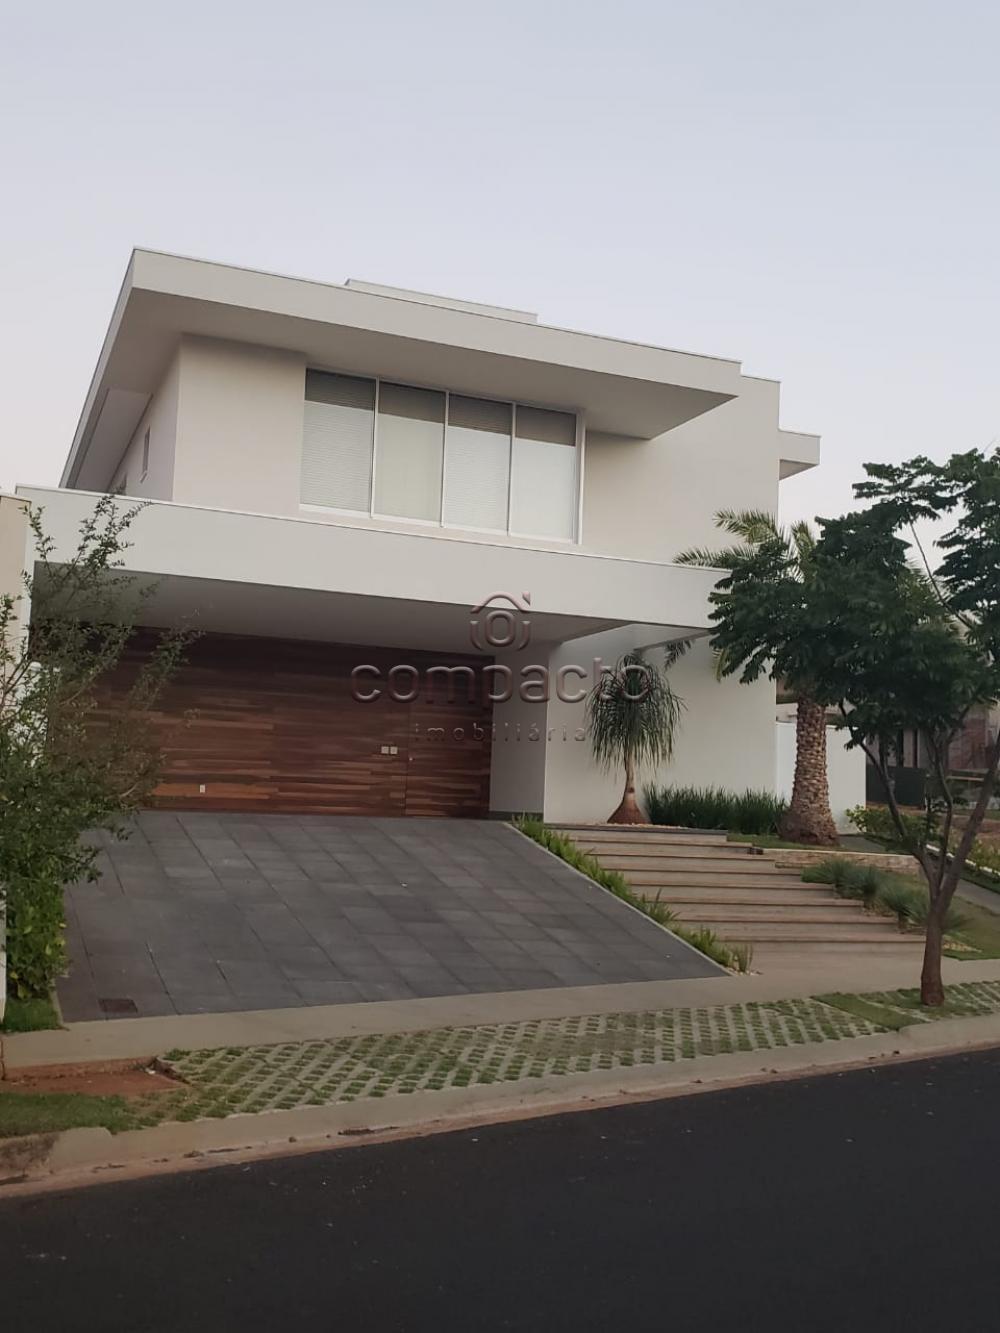 Sao Jose do Rio Preto Casa Venda R$3.600.000,00 Condominio R$880,00 4 Dormitorios 4 Suites Area do terreno 545.00m2 Area construida 500.00m2